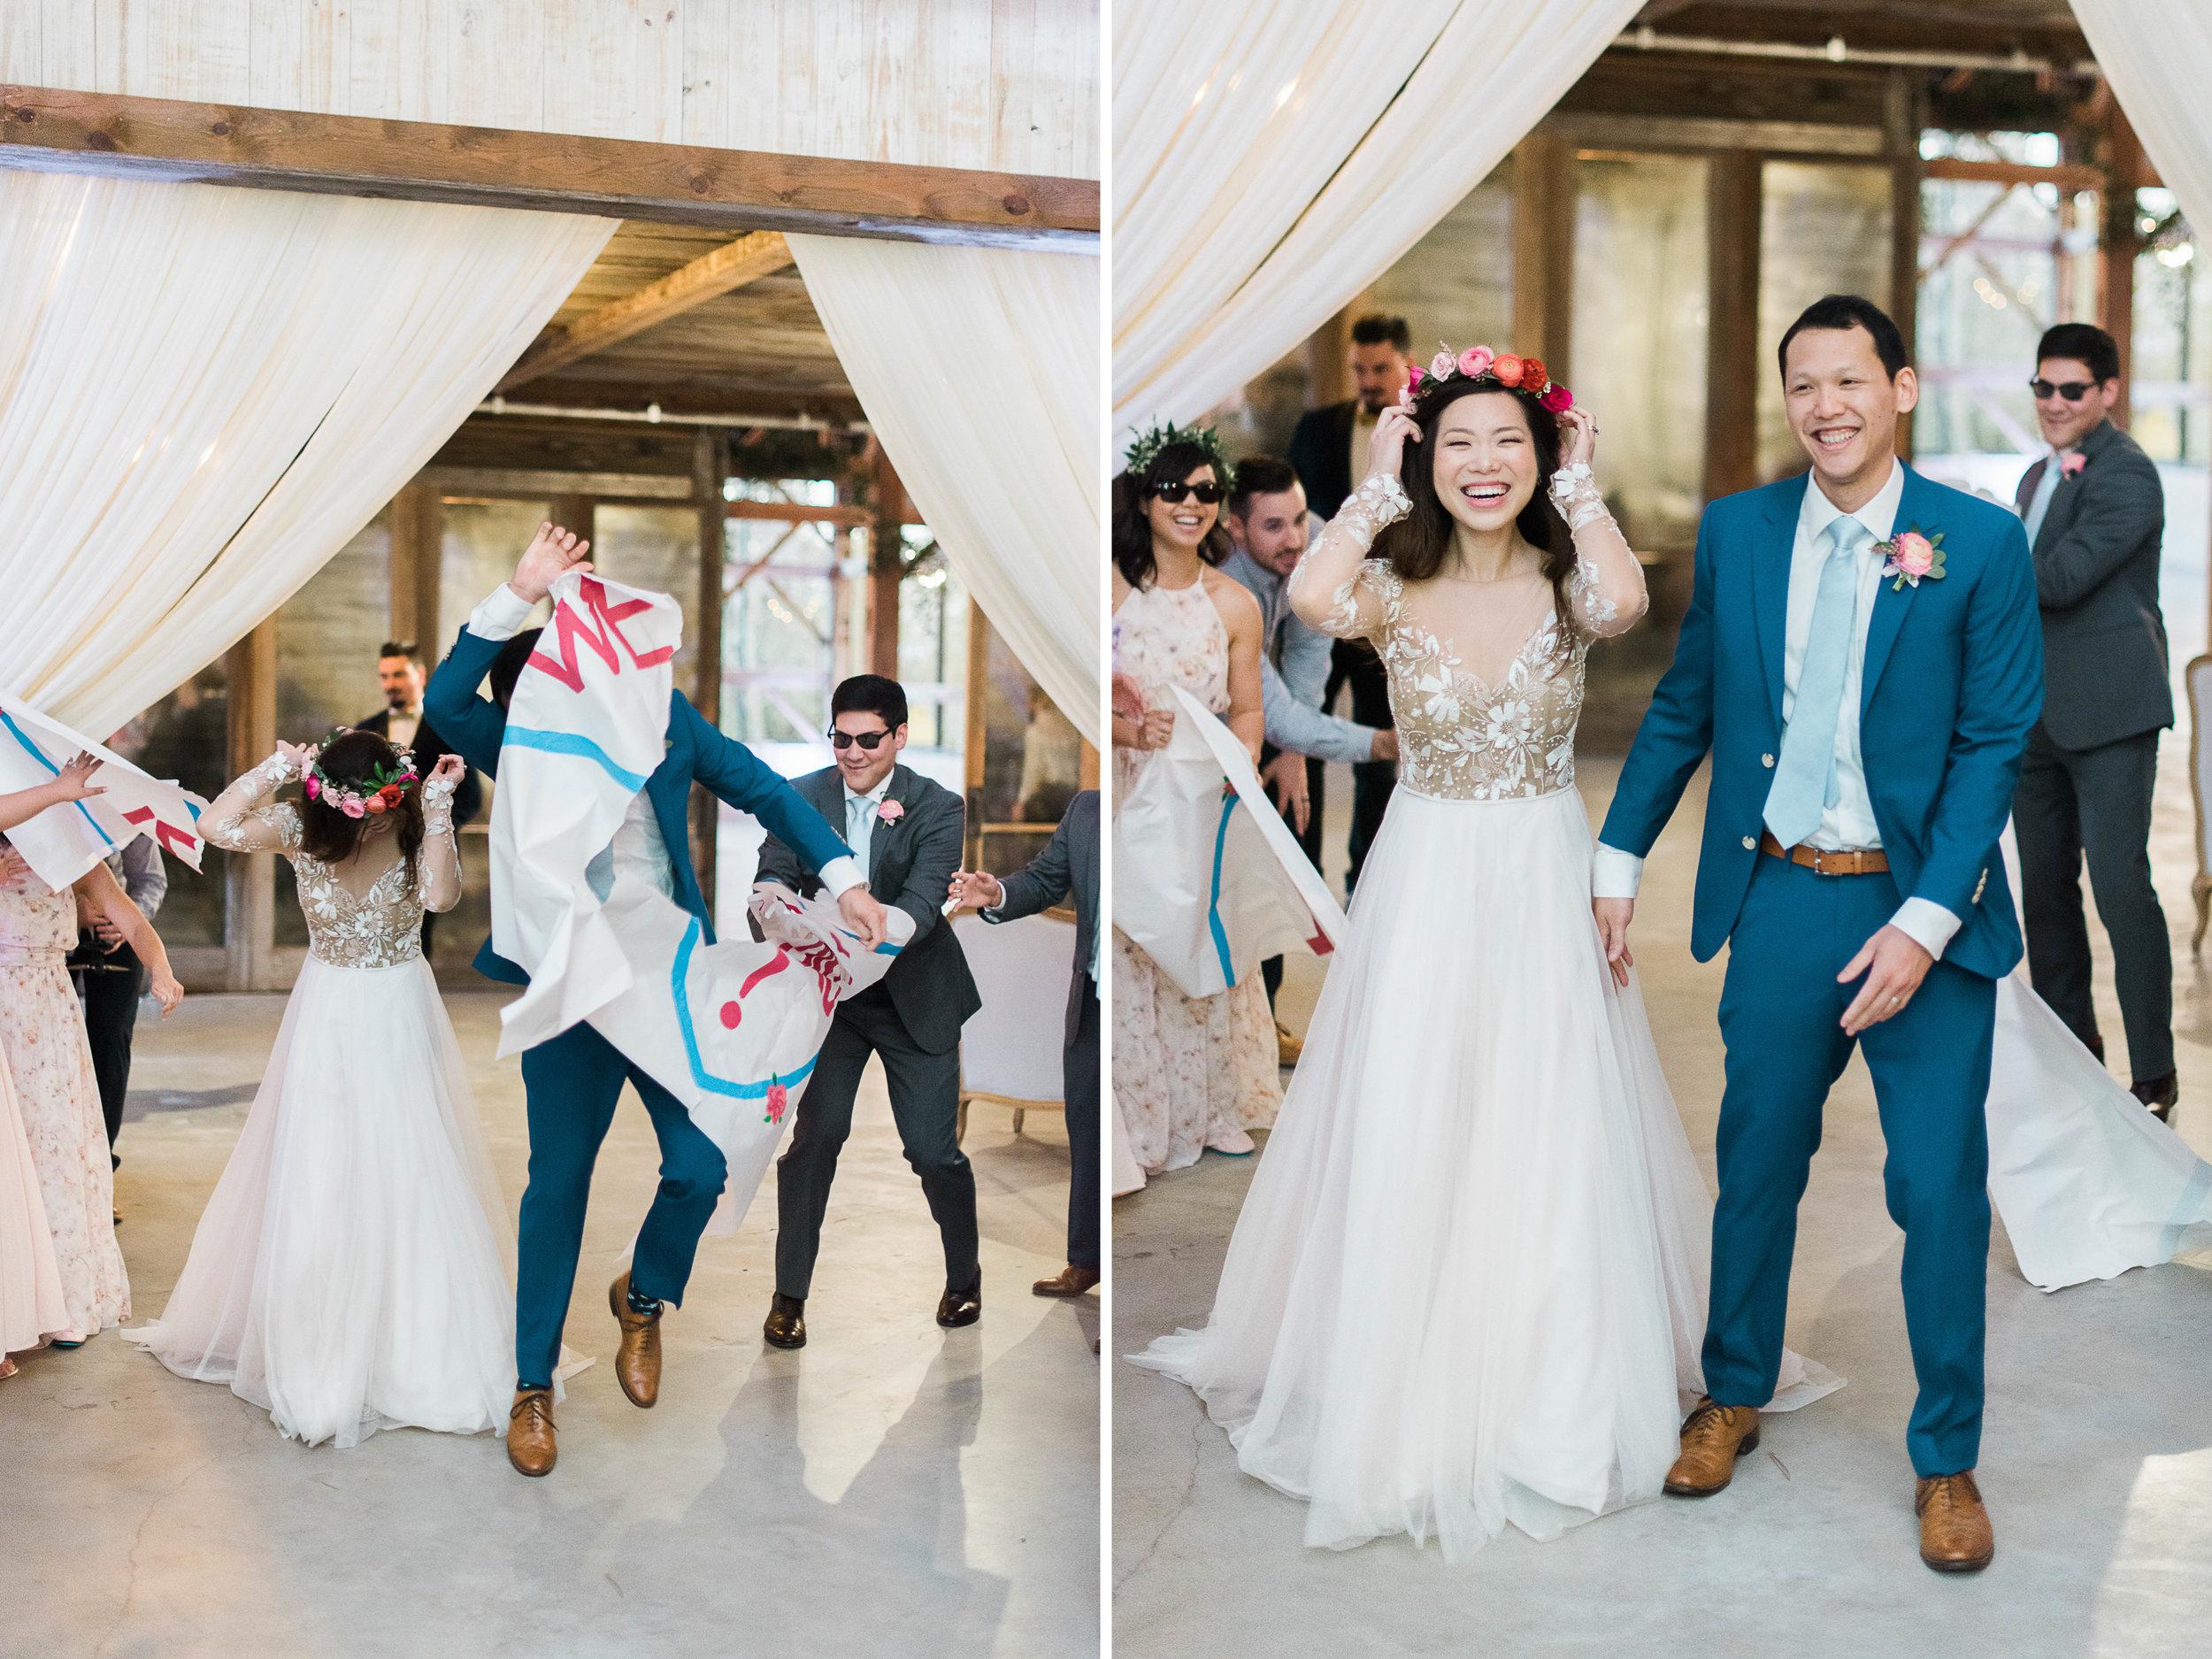 The-Knot-50-Weddings-50-States-Texas-Winner-Dana-Fernandez-photography-houston-wedding-photographer-film-fine-art-destination-174.jpg